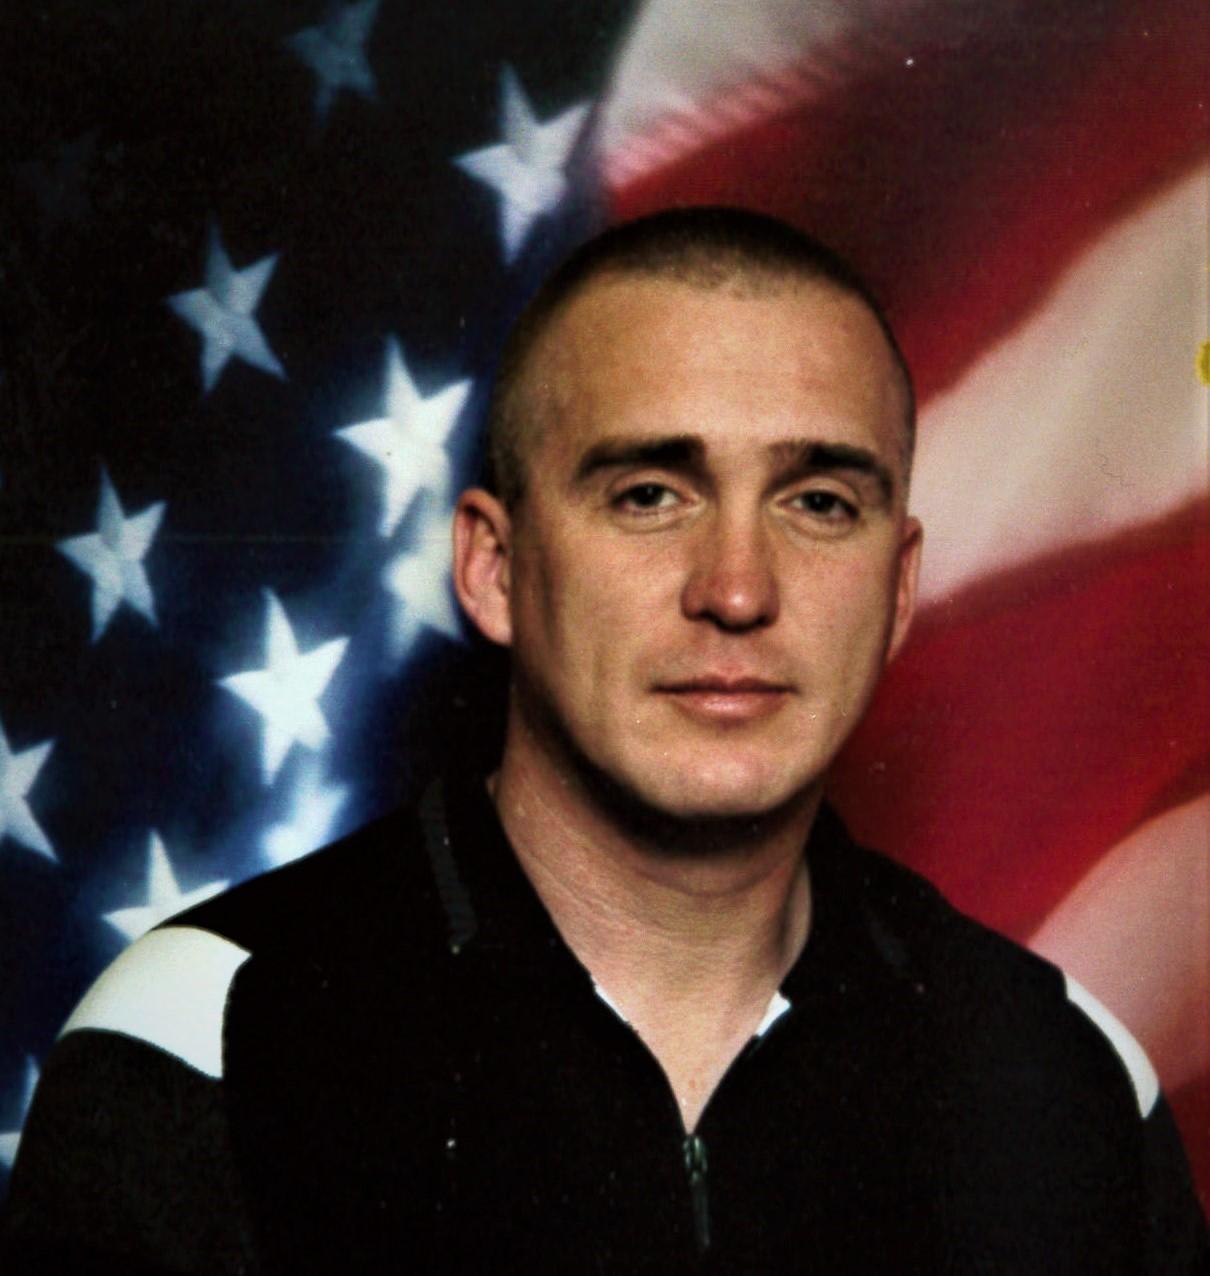 Terry Muhlhauser